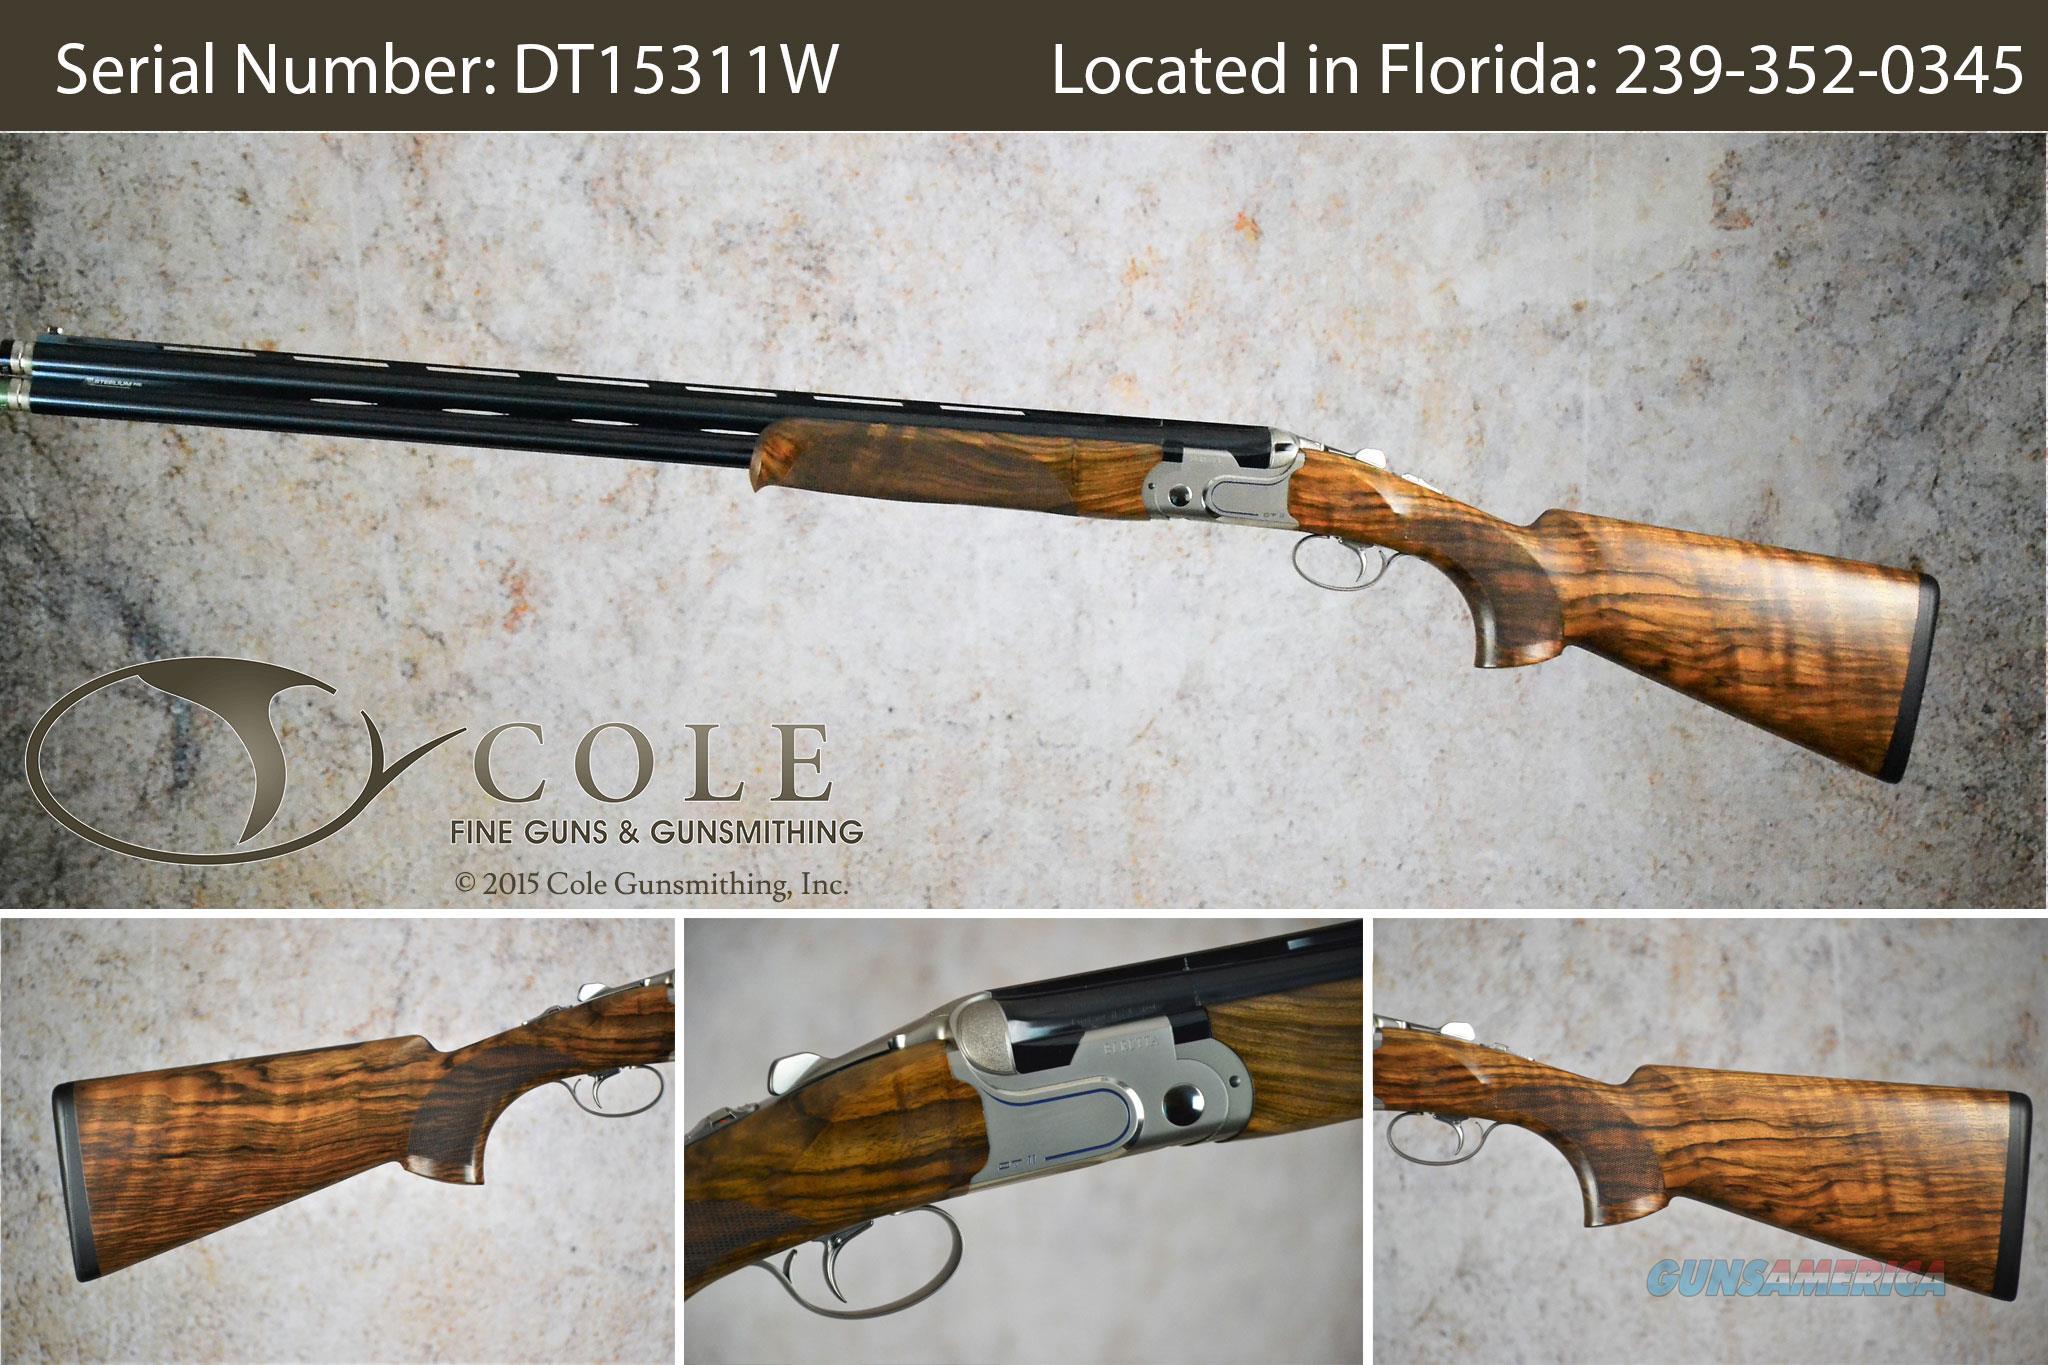 "Beretta DT11 Sporting 12g 30"" SN:#DT15311W~~In Our Sarasota Store~~  Guns > Shotguns > Beretta Shotguns > O/U > Trap/Skeet"